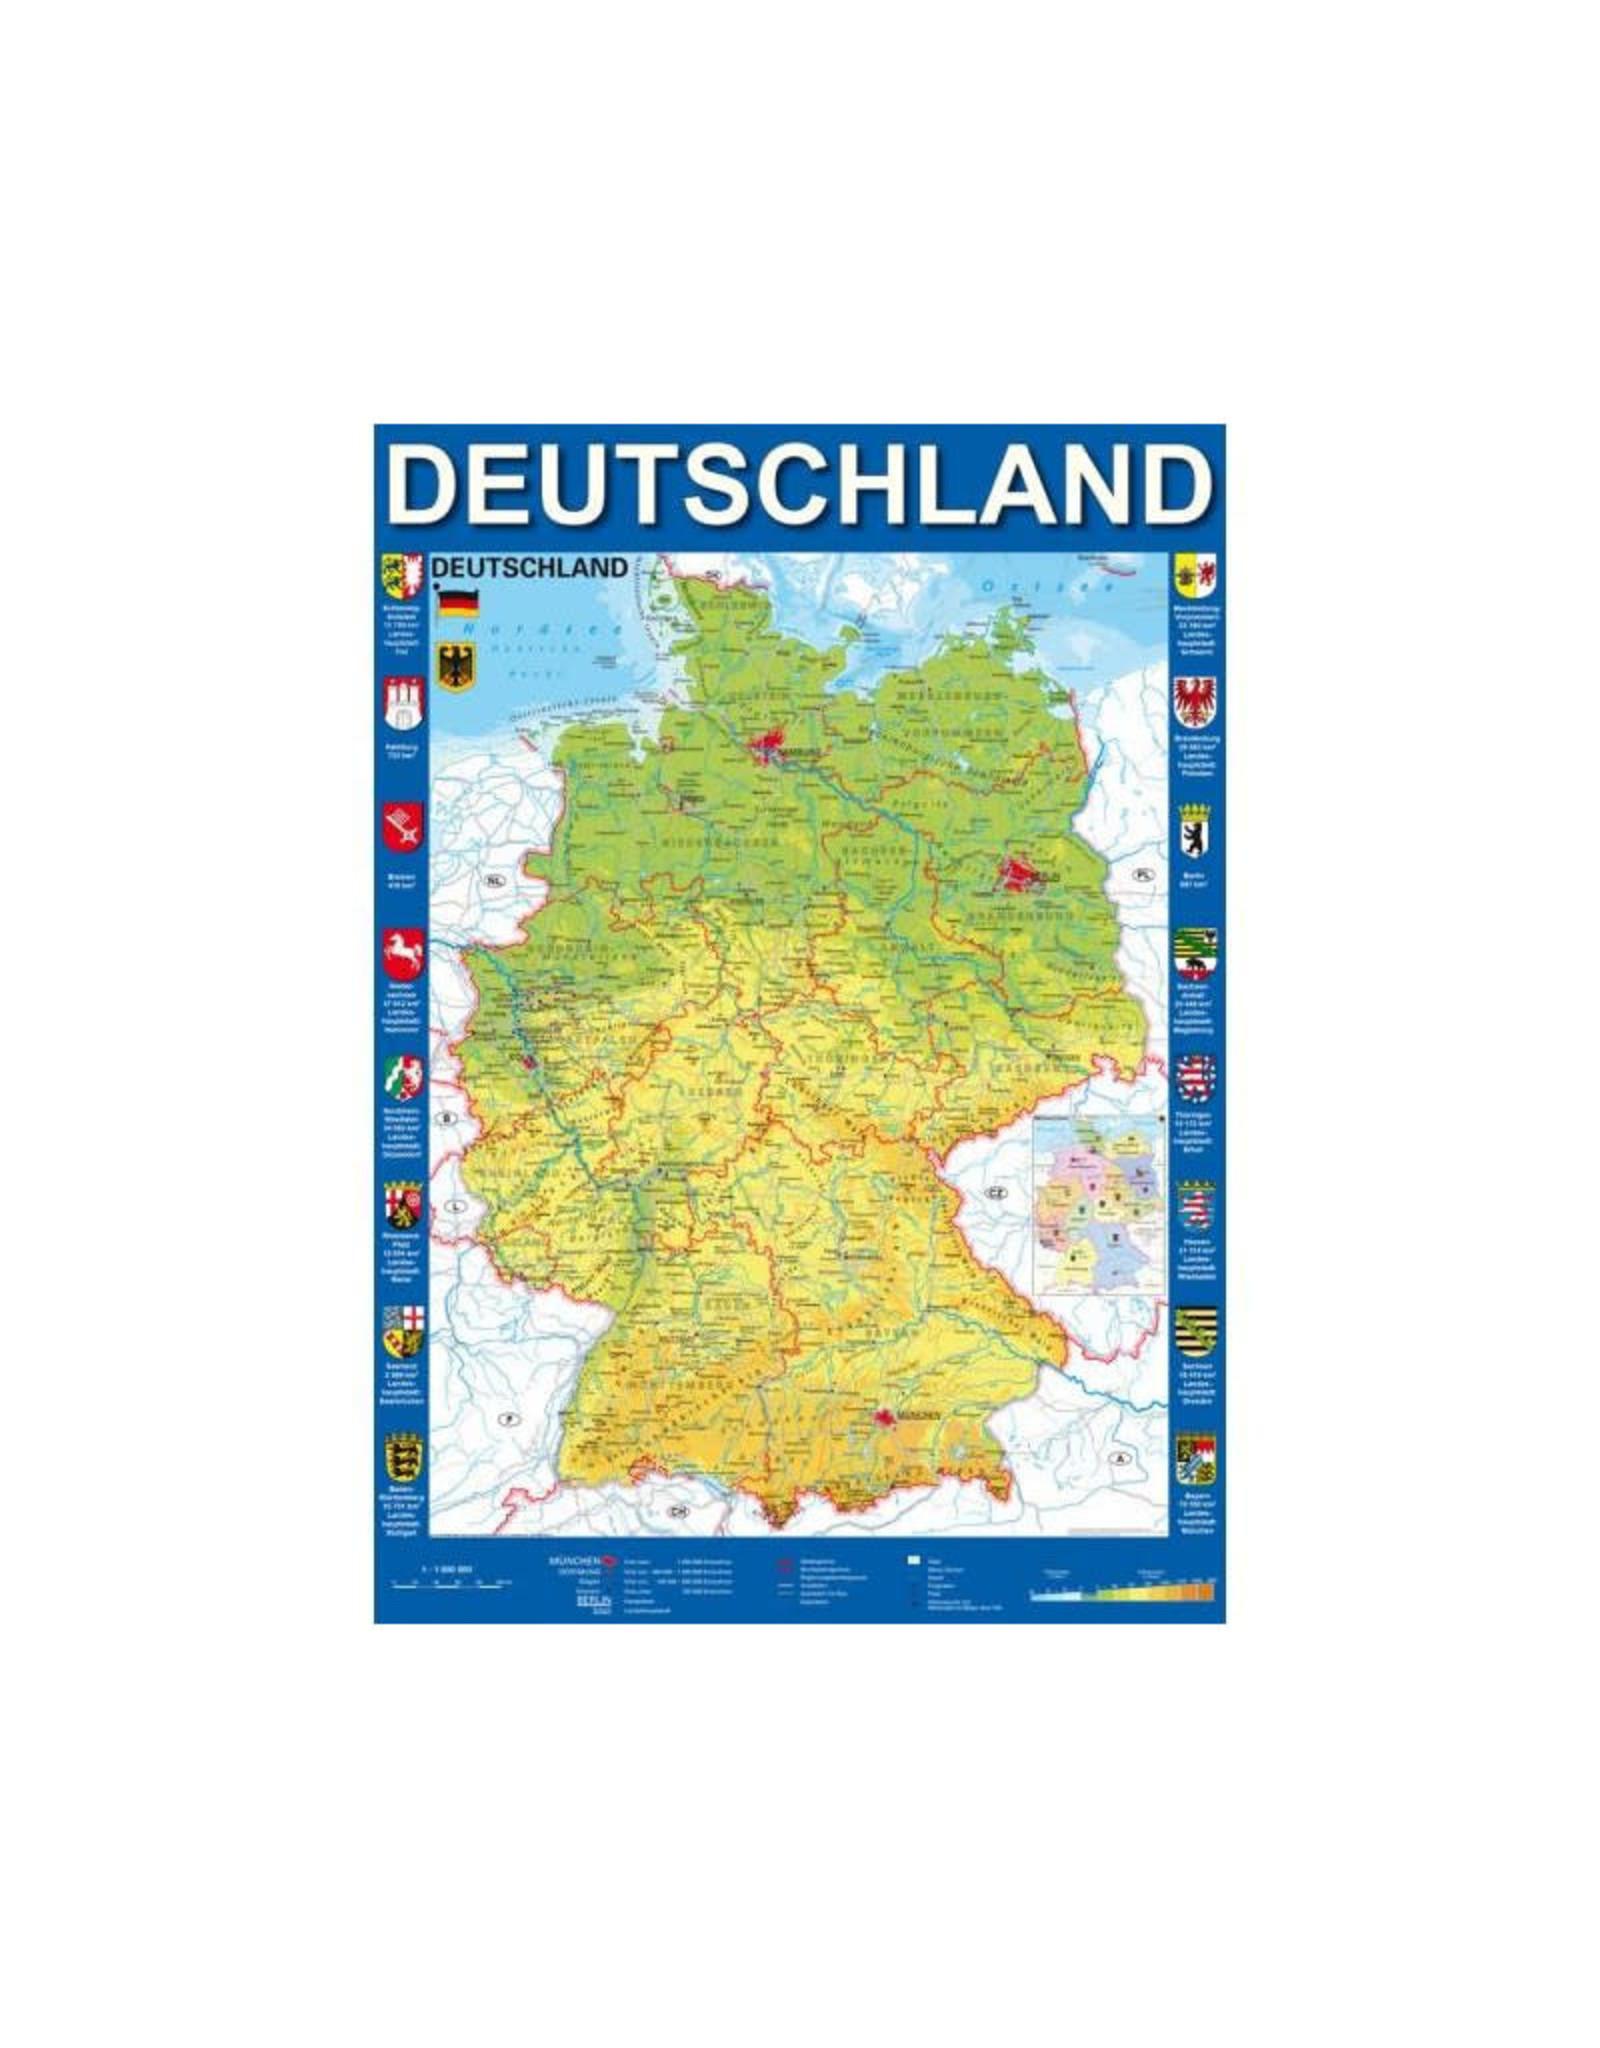 Schmidt Map of Germany 1000 PCS